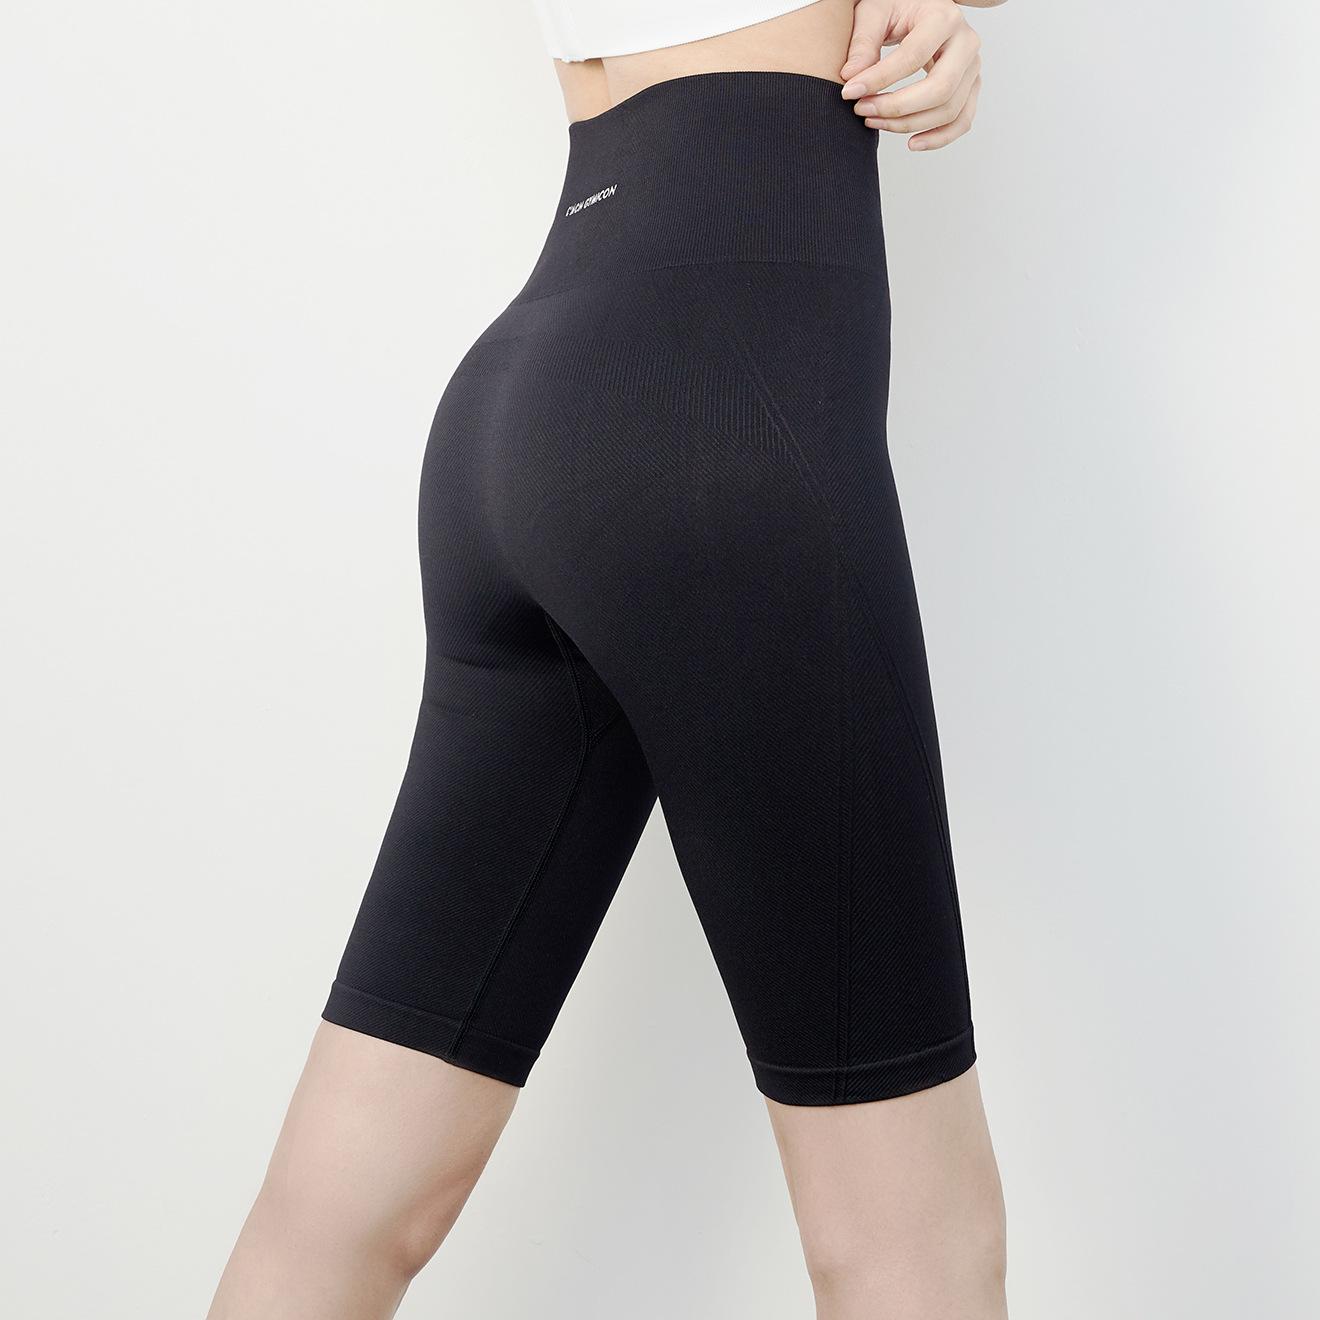 New summer Yoga Pants high waist elastic quick dry running Capris thin fitness shorts